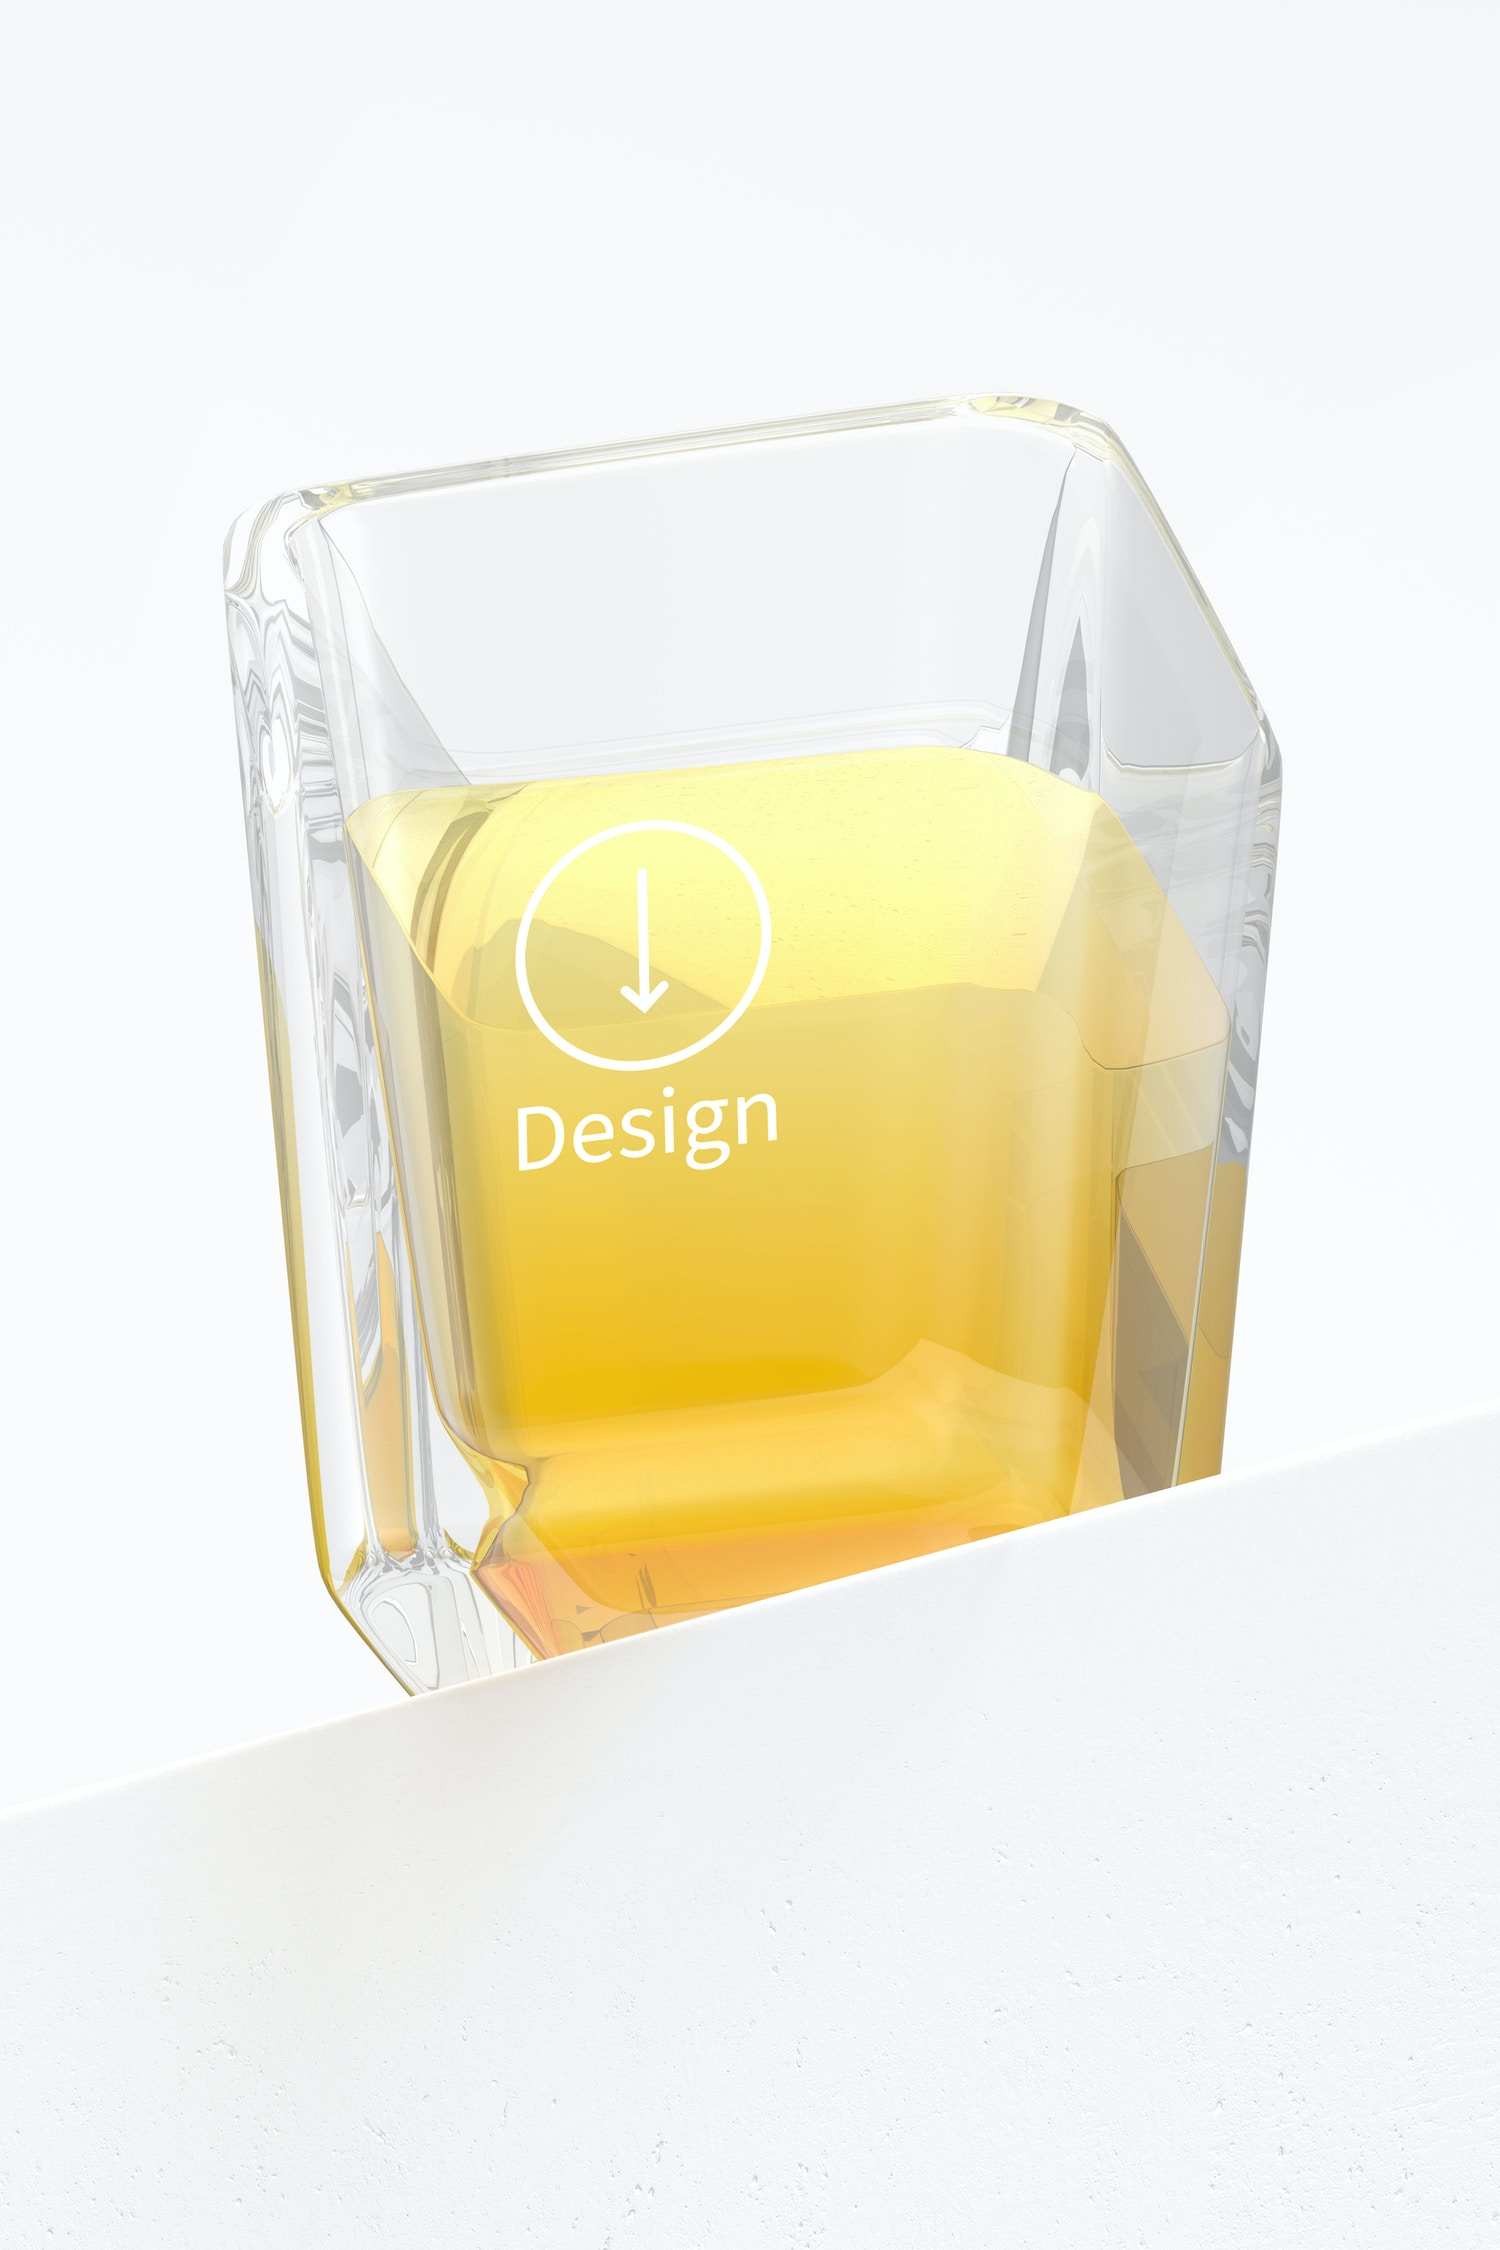 Square Shot Glass Mockup, Low Angle View